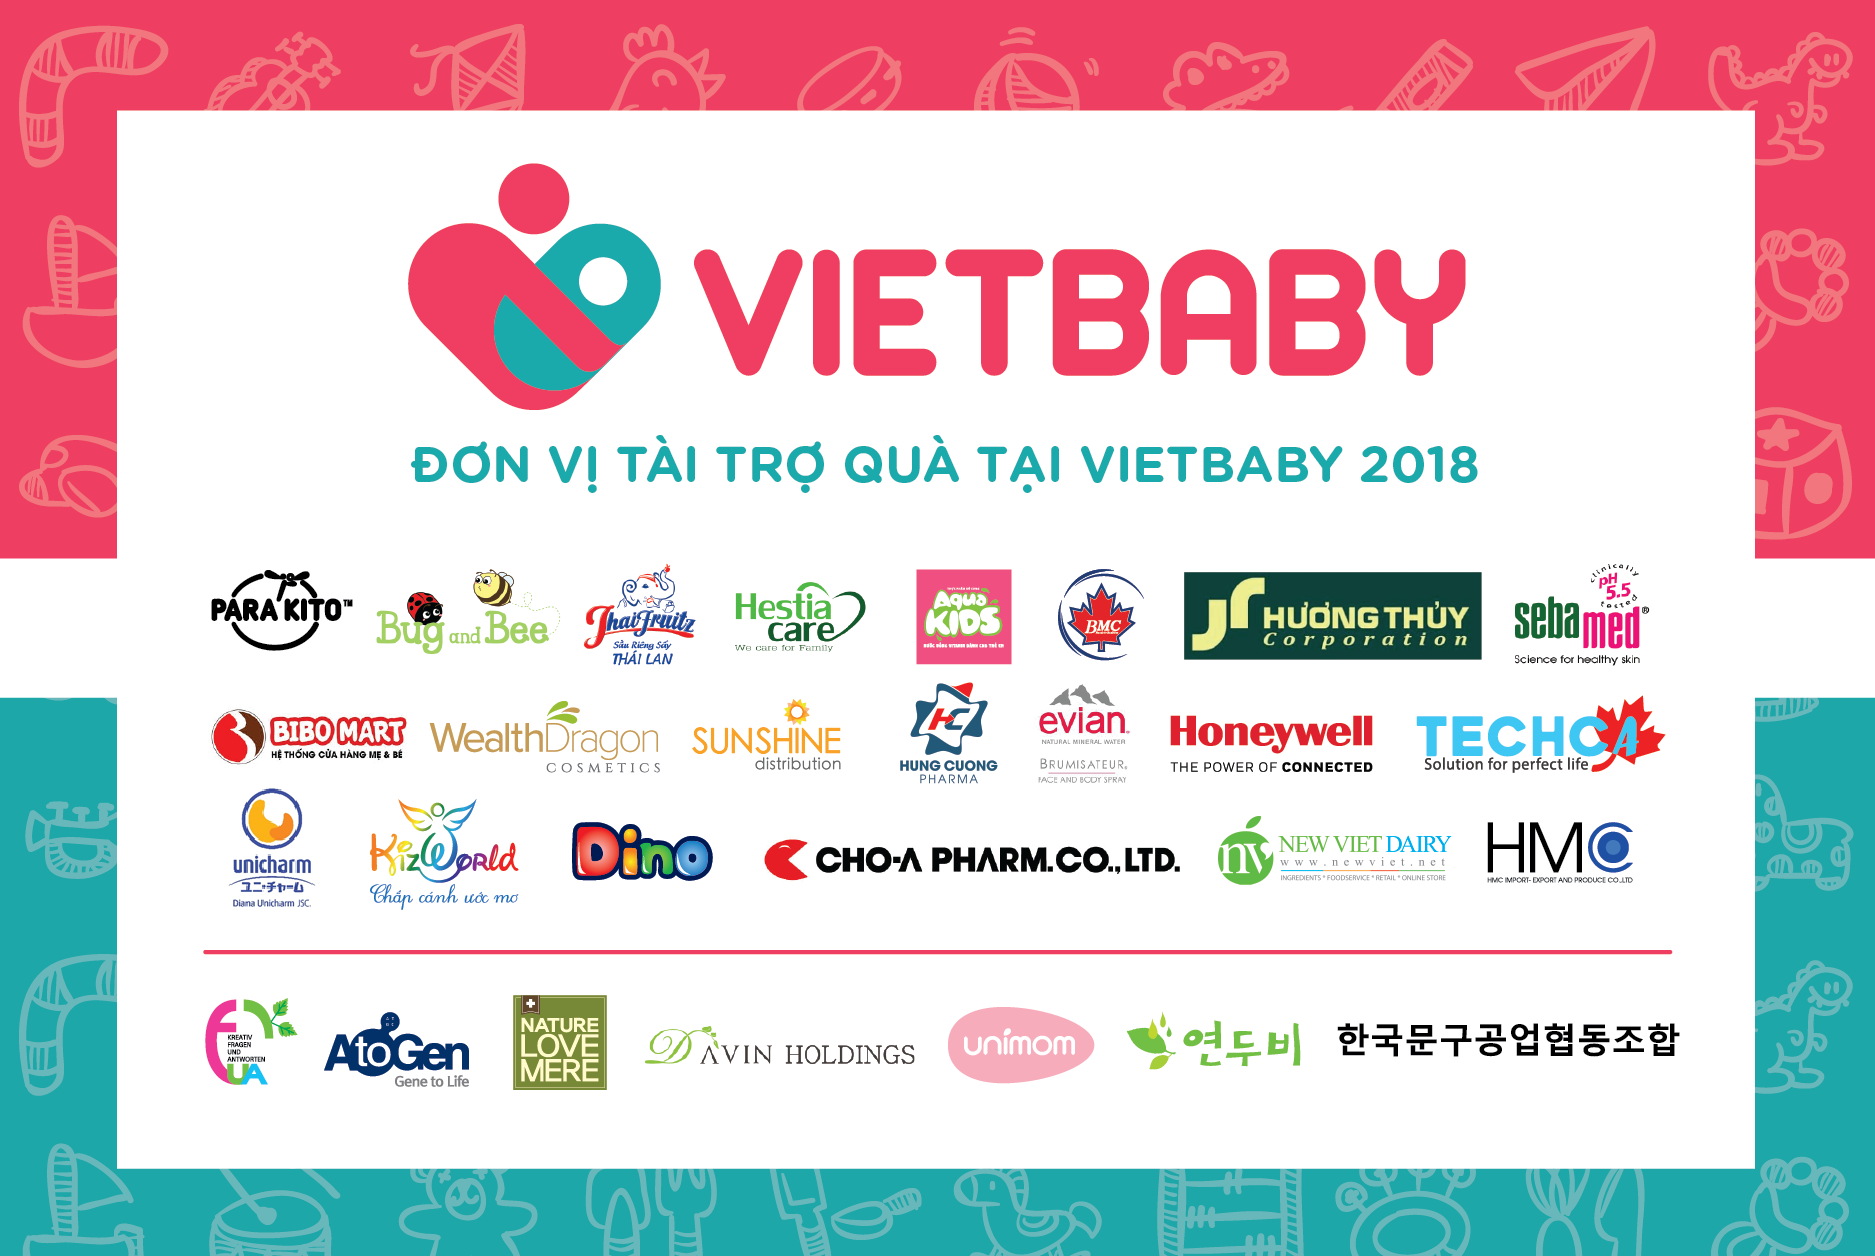 VIETBABY 2018 – Xu so than tien cho Me & be – Giam gia CUC SOC len đen 50% 4